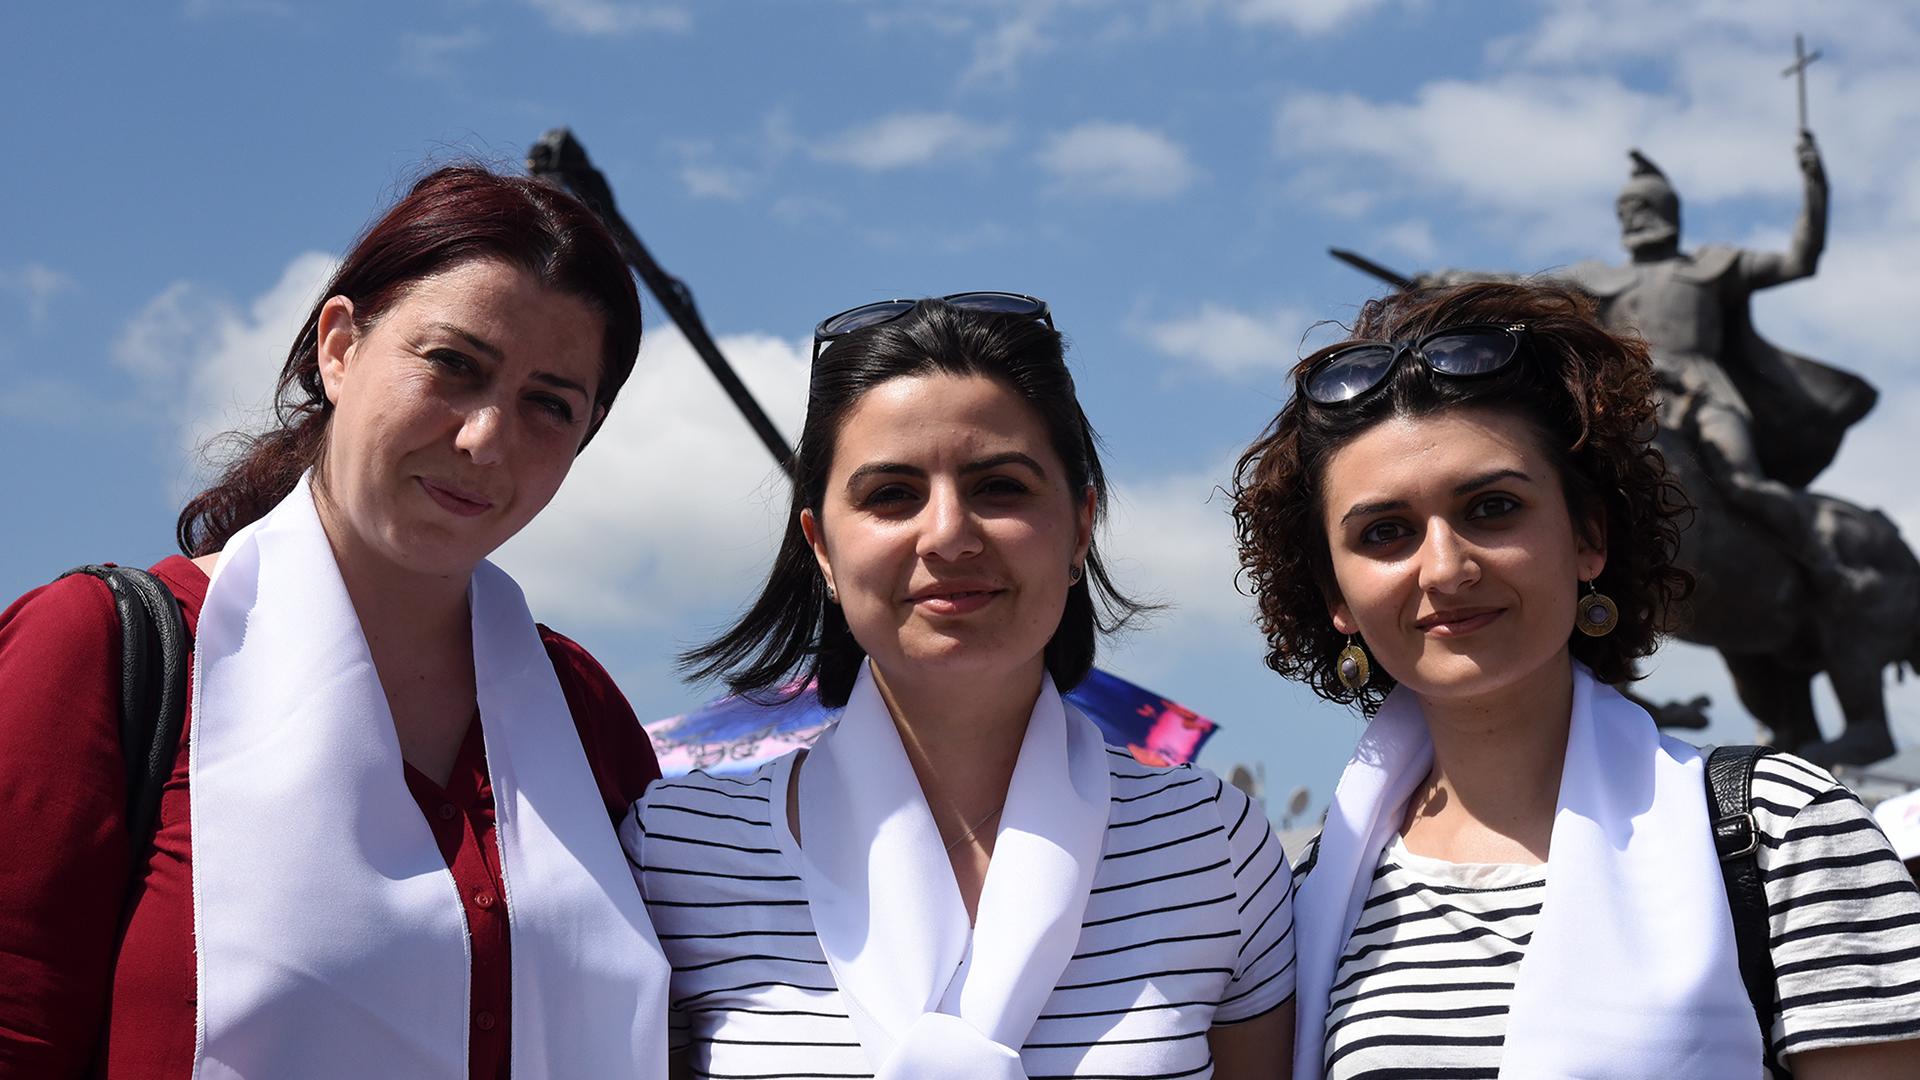 De gauche à droite: Angela Guévorkyan, Susanna Grigoryan et Rusana Baloyan (Photo: Pierre Pistoletti)